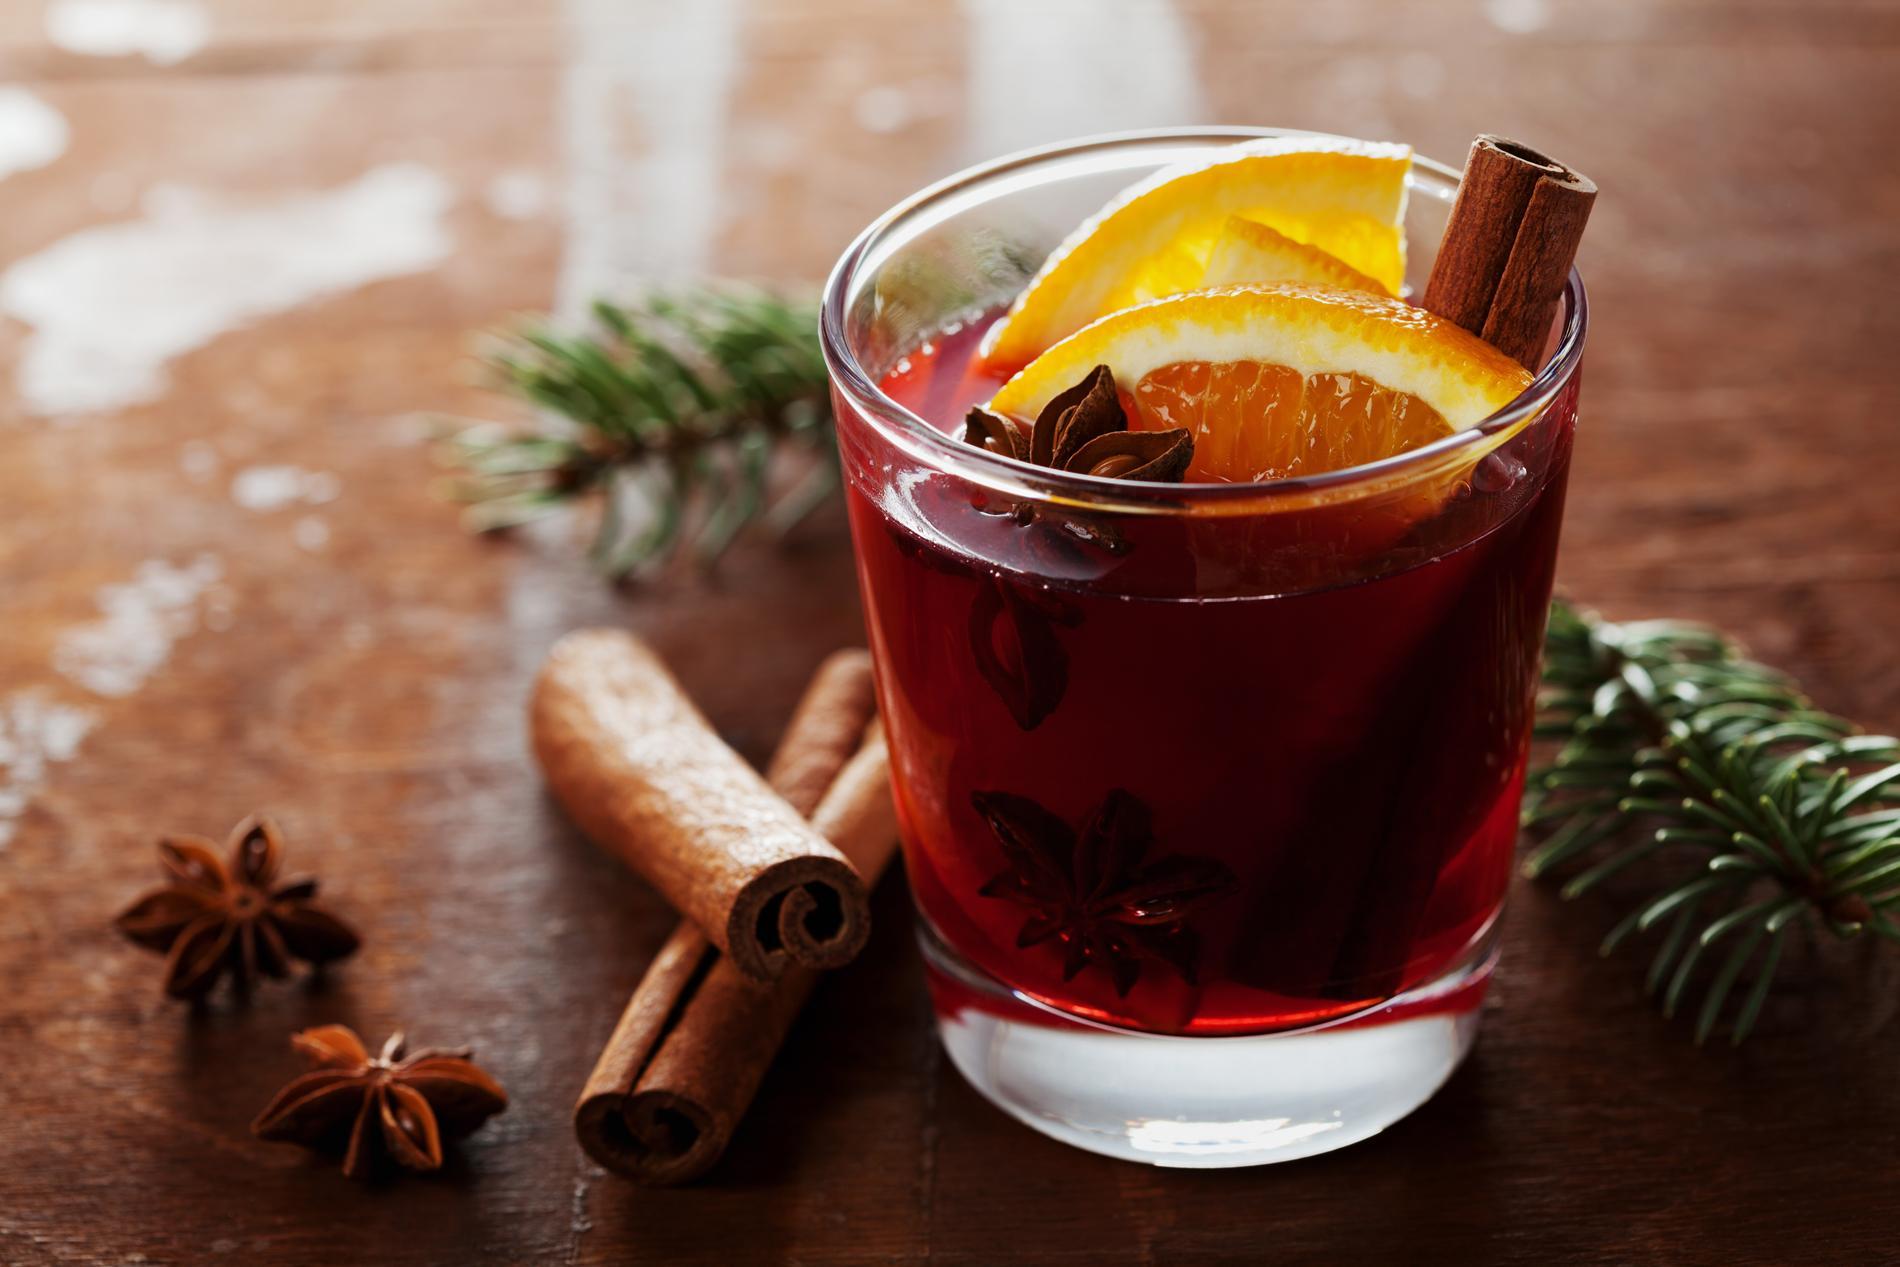 熱紅酒 Vin Chaud